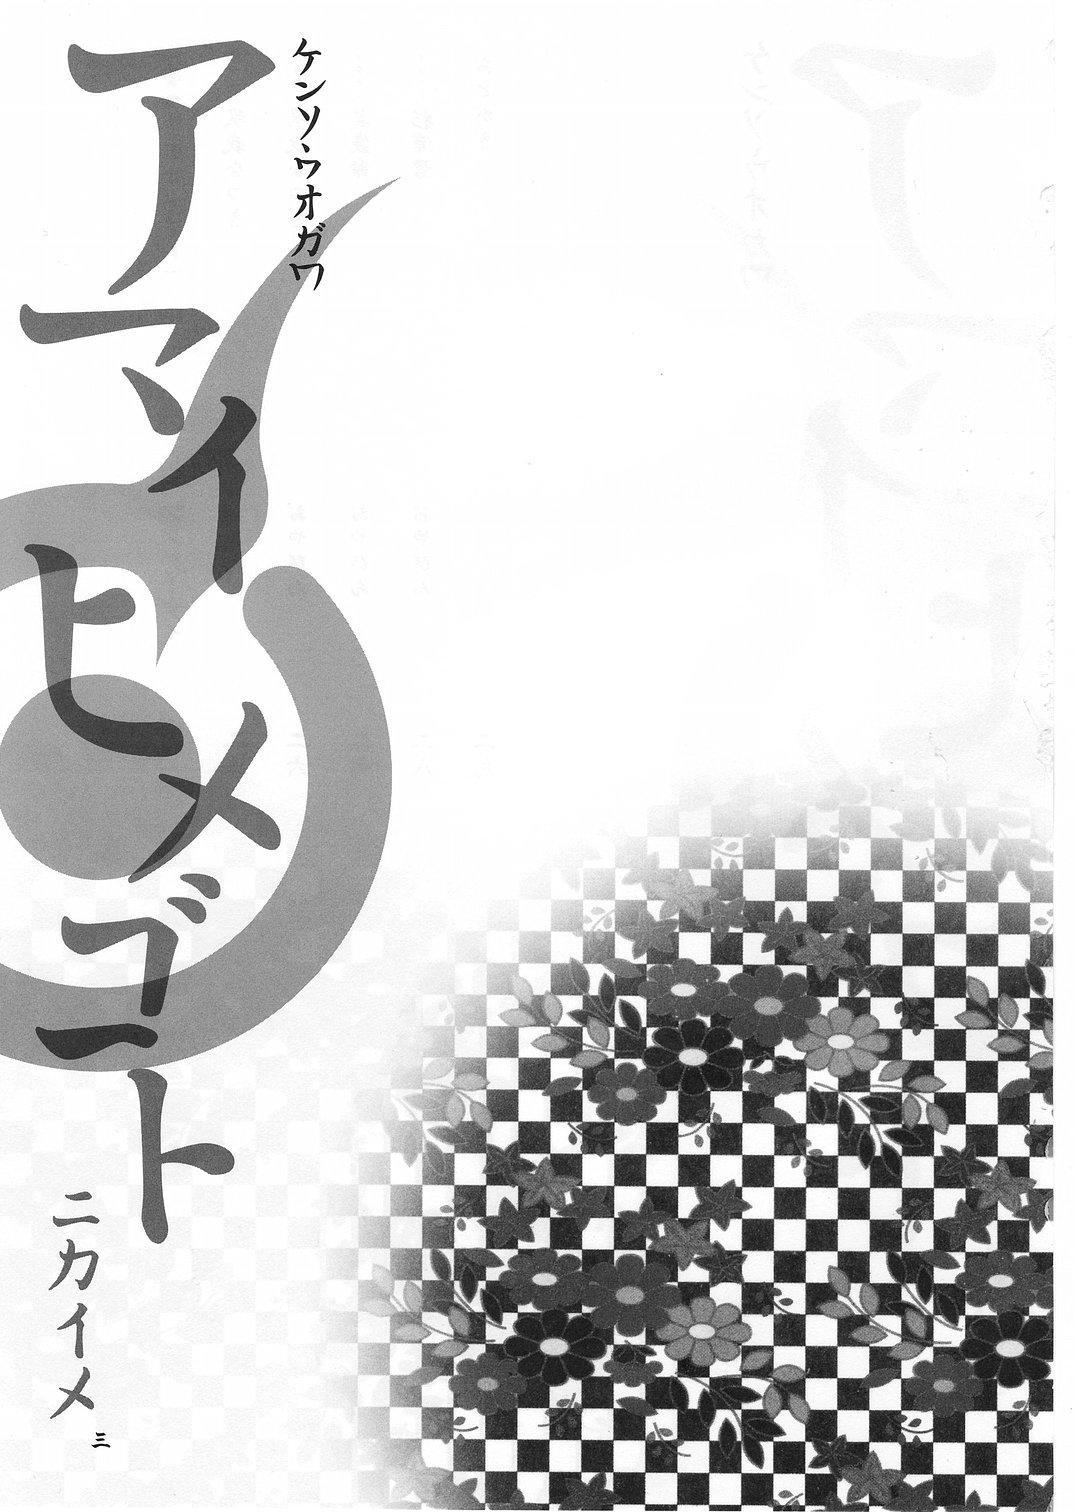 Amai Himegoto Nikaime 1